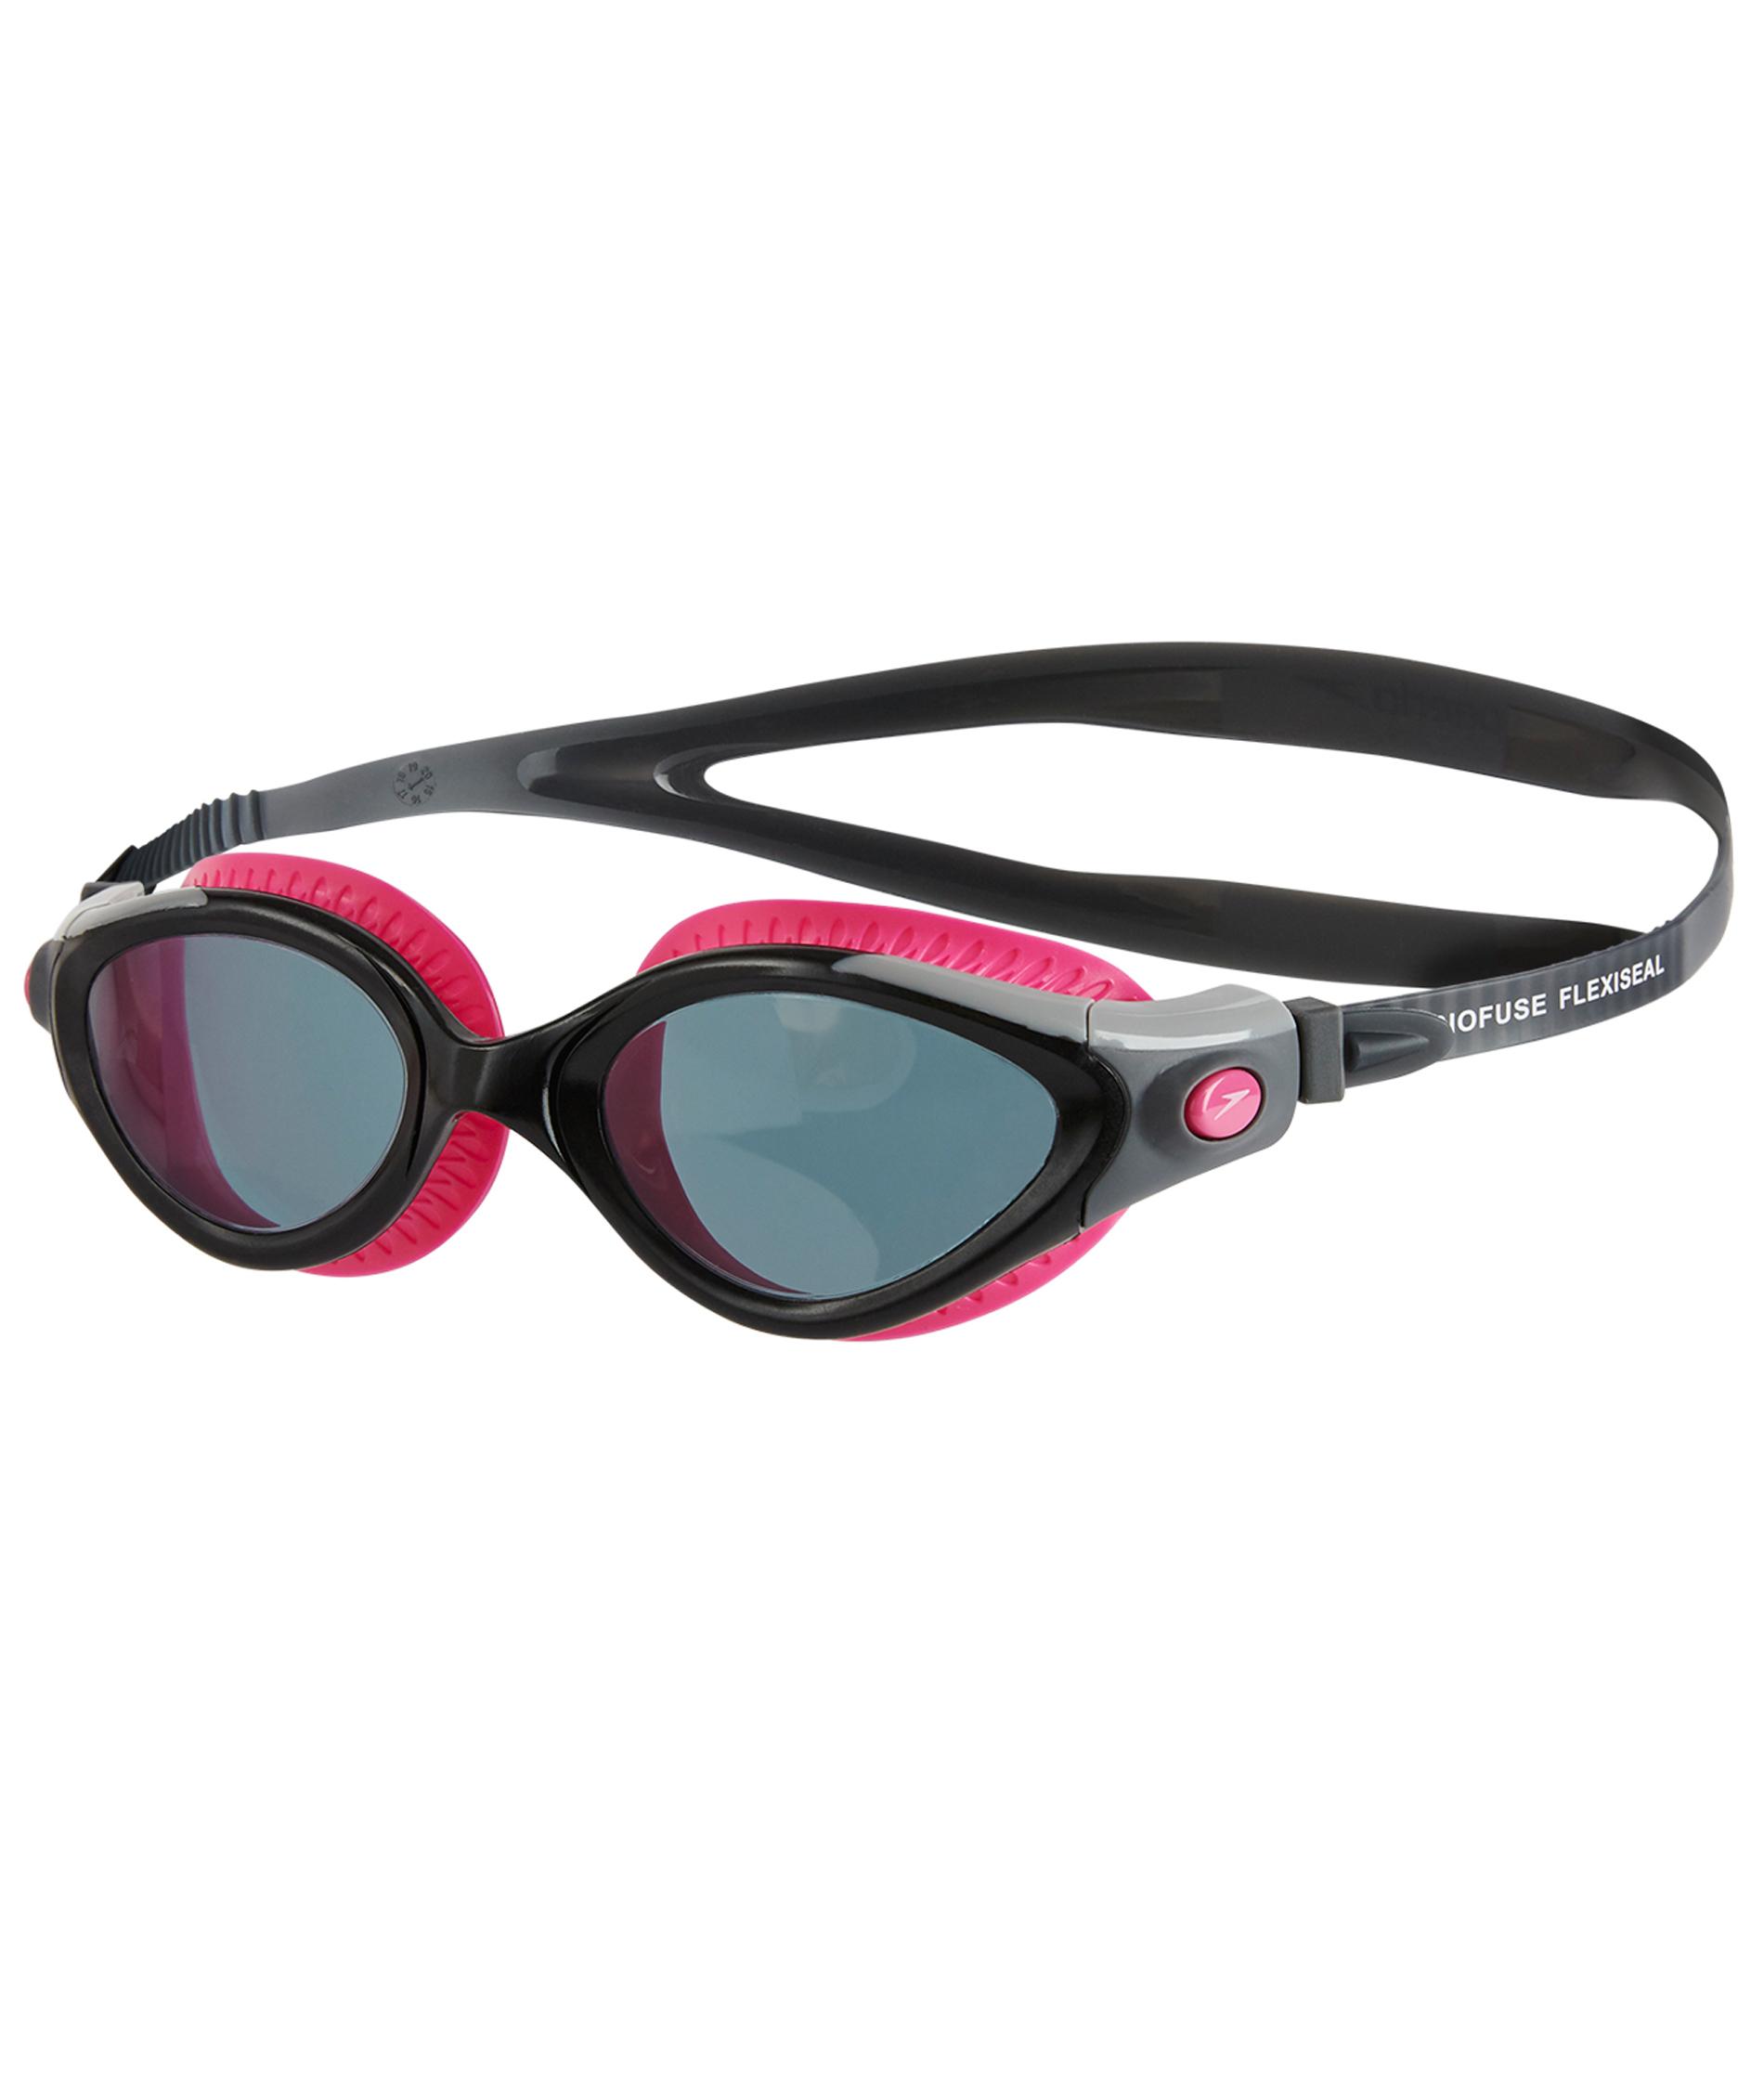 Speedo Futura Biofuse Flexiseal Female Goggle - Pink/Smoke